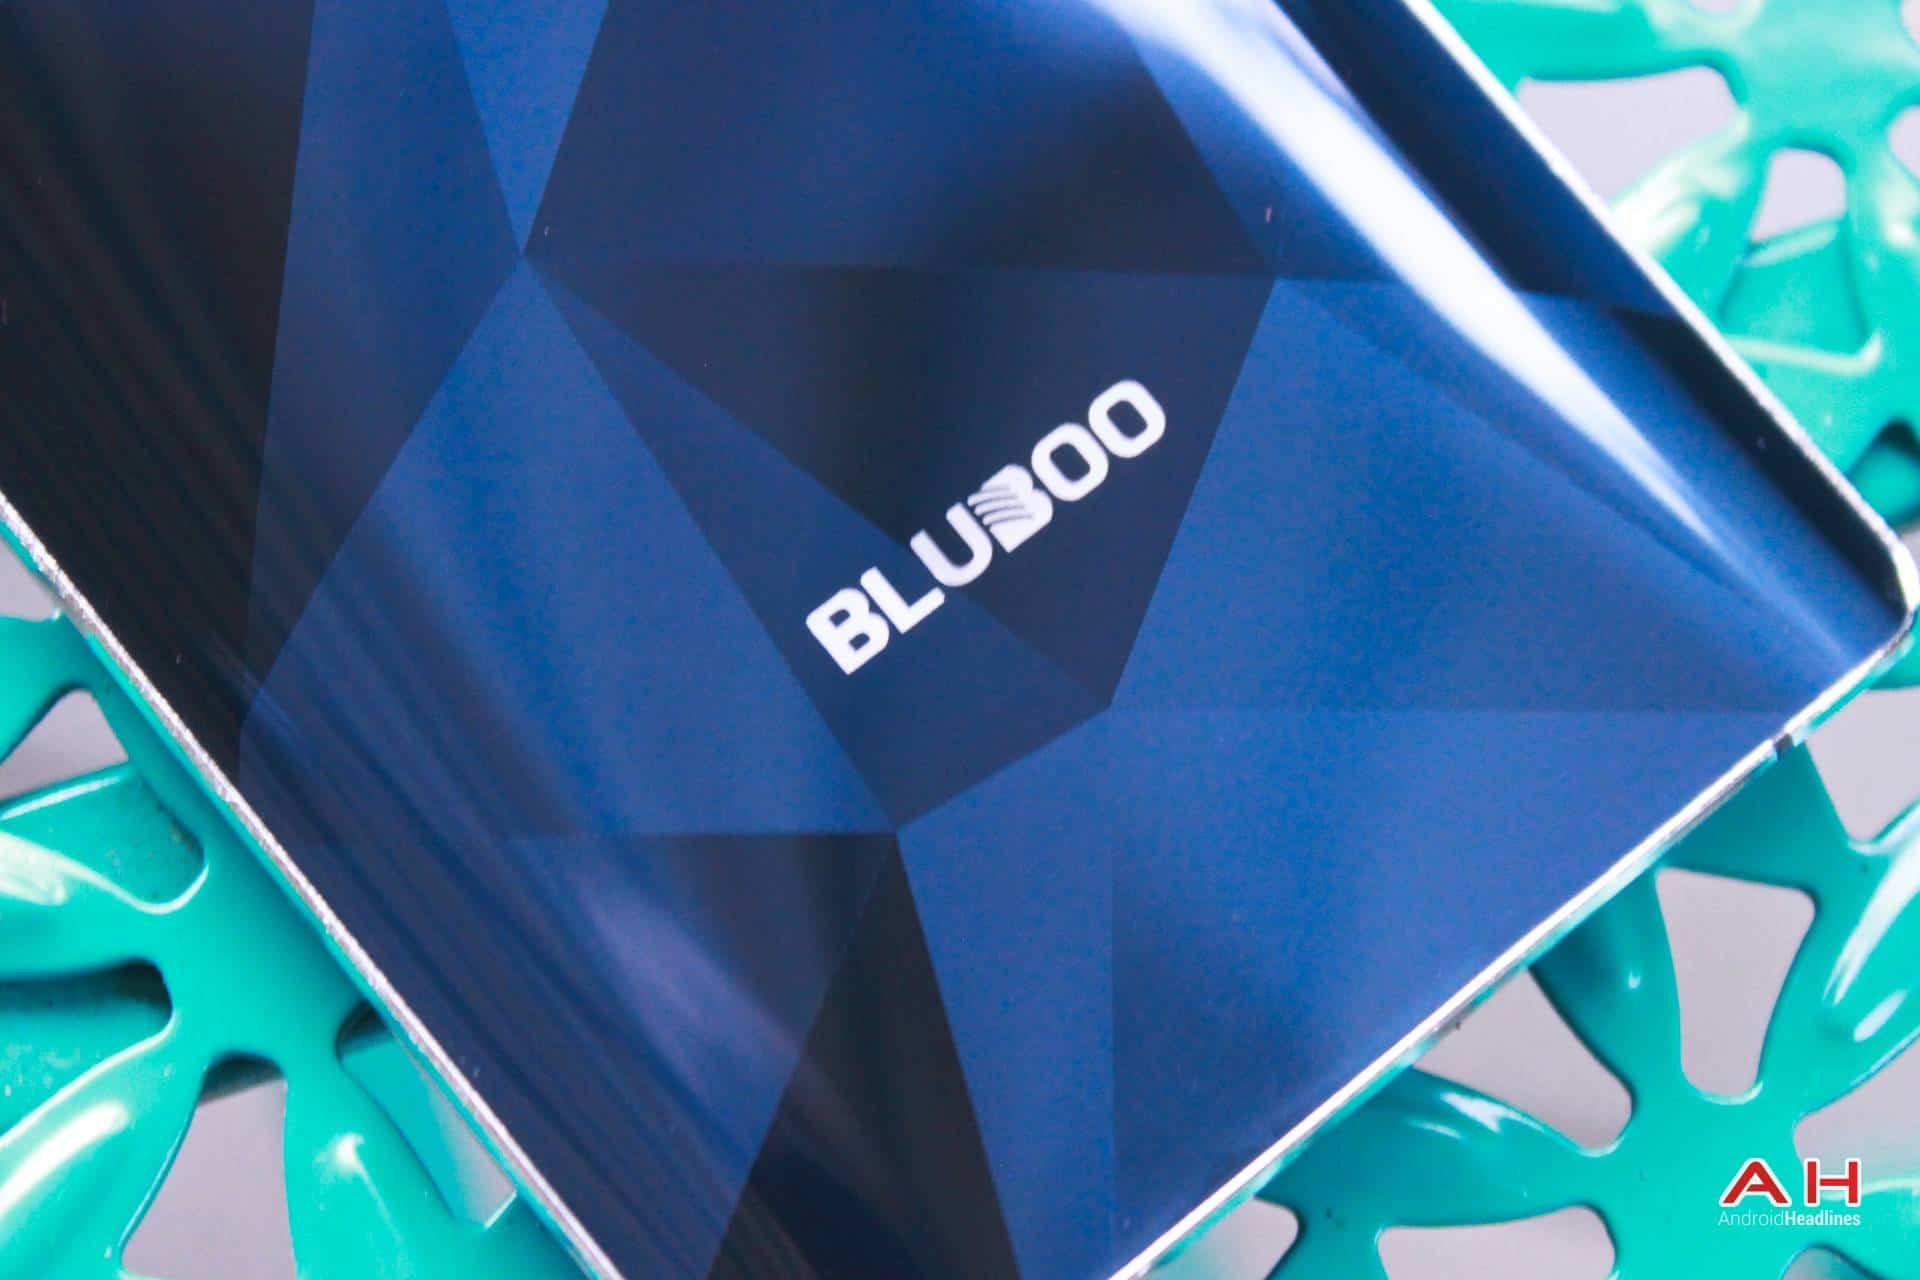 AH Bluboo Xtouch-5